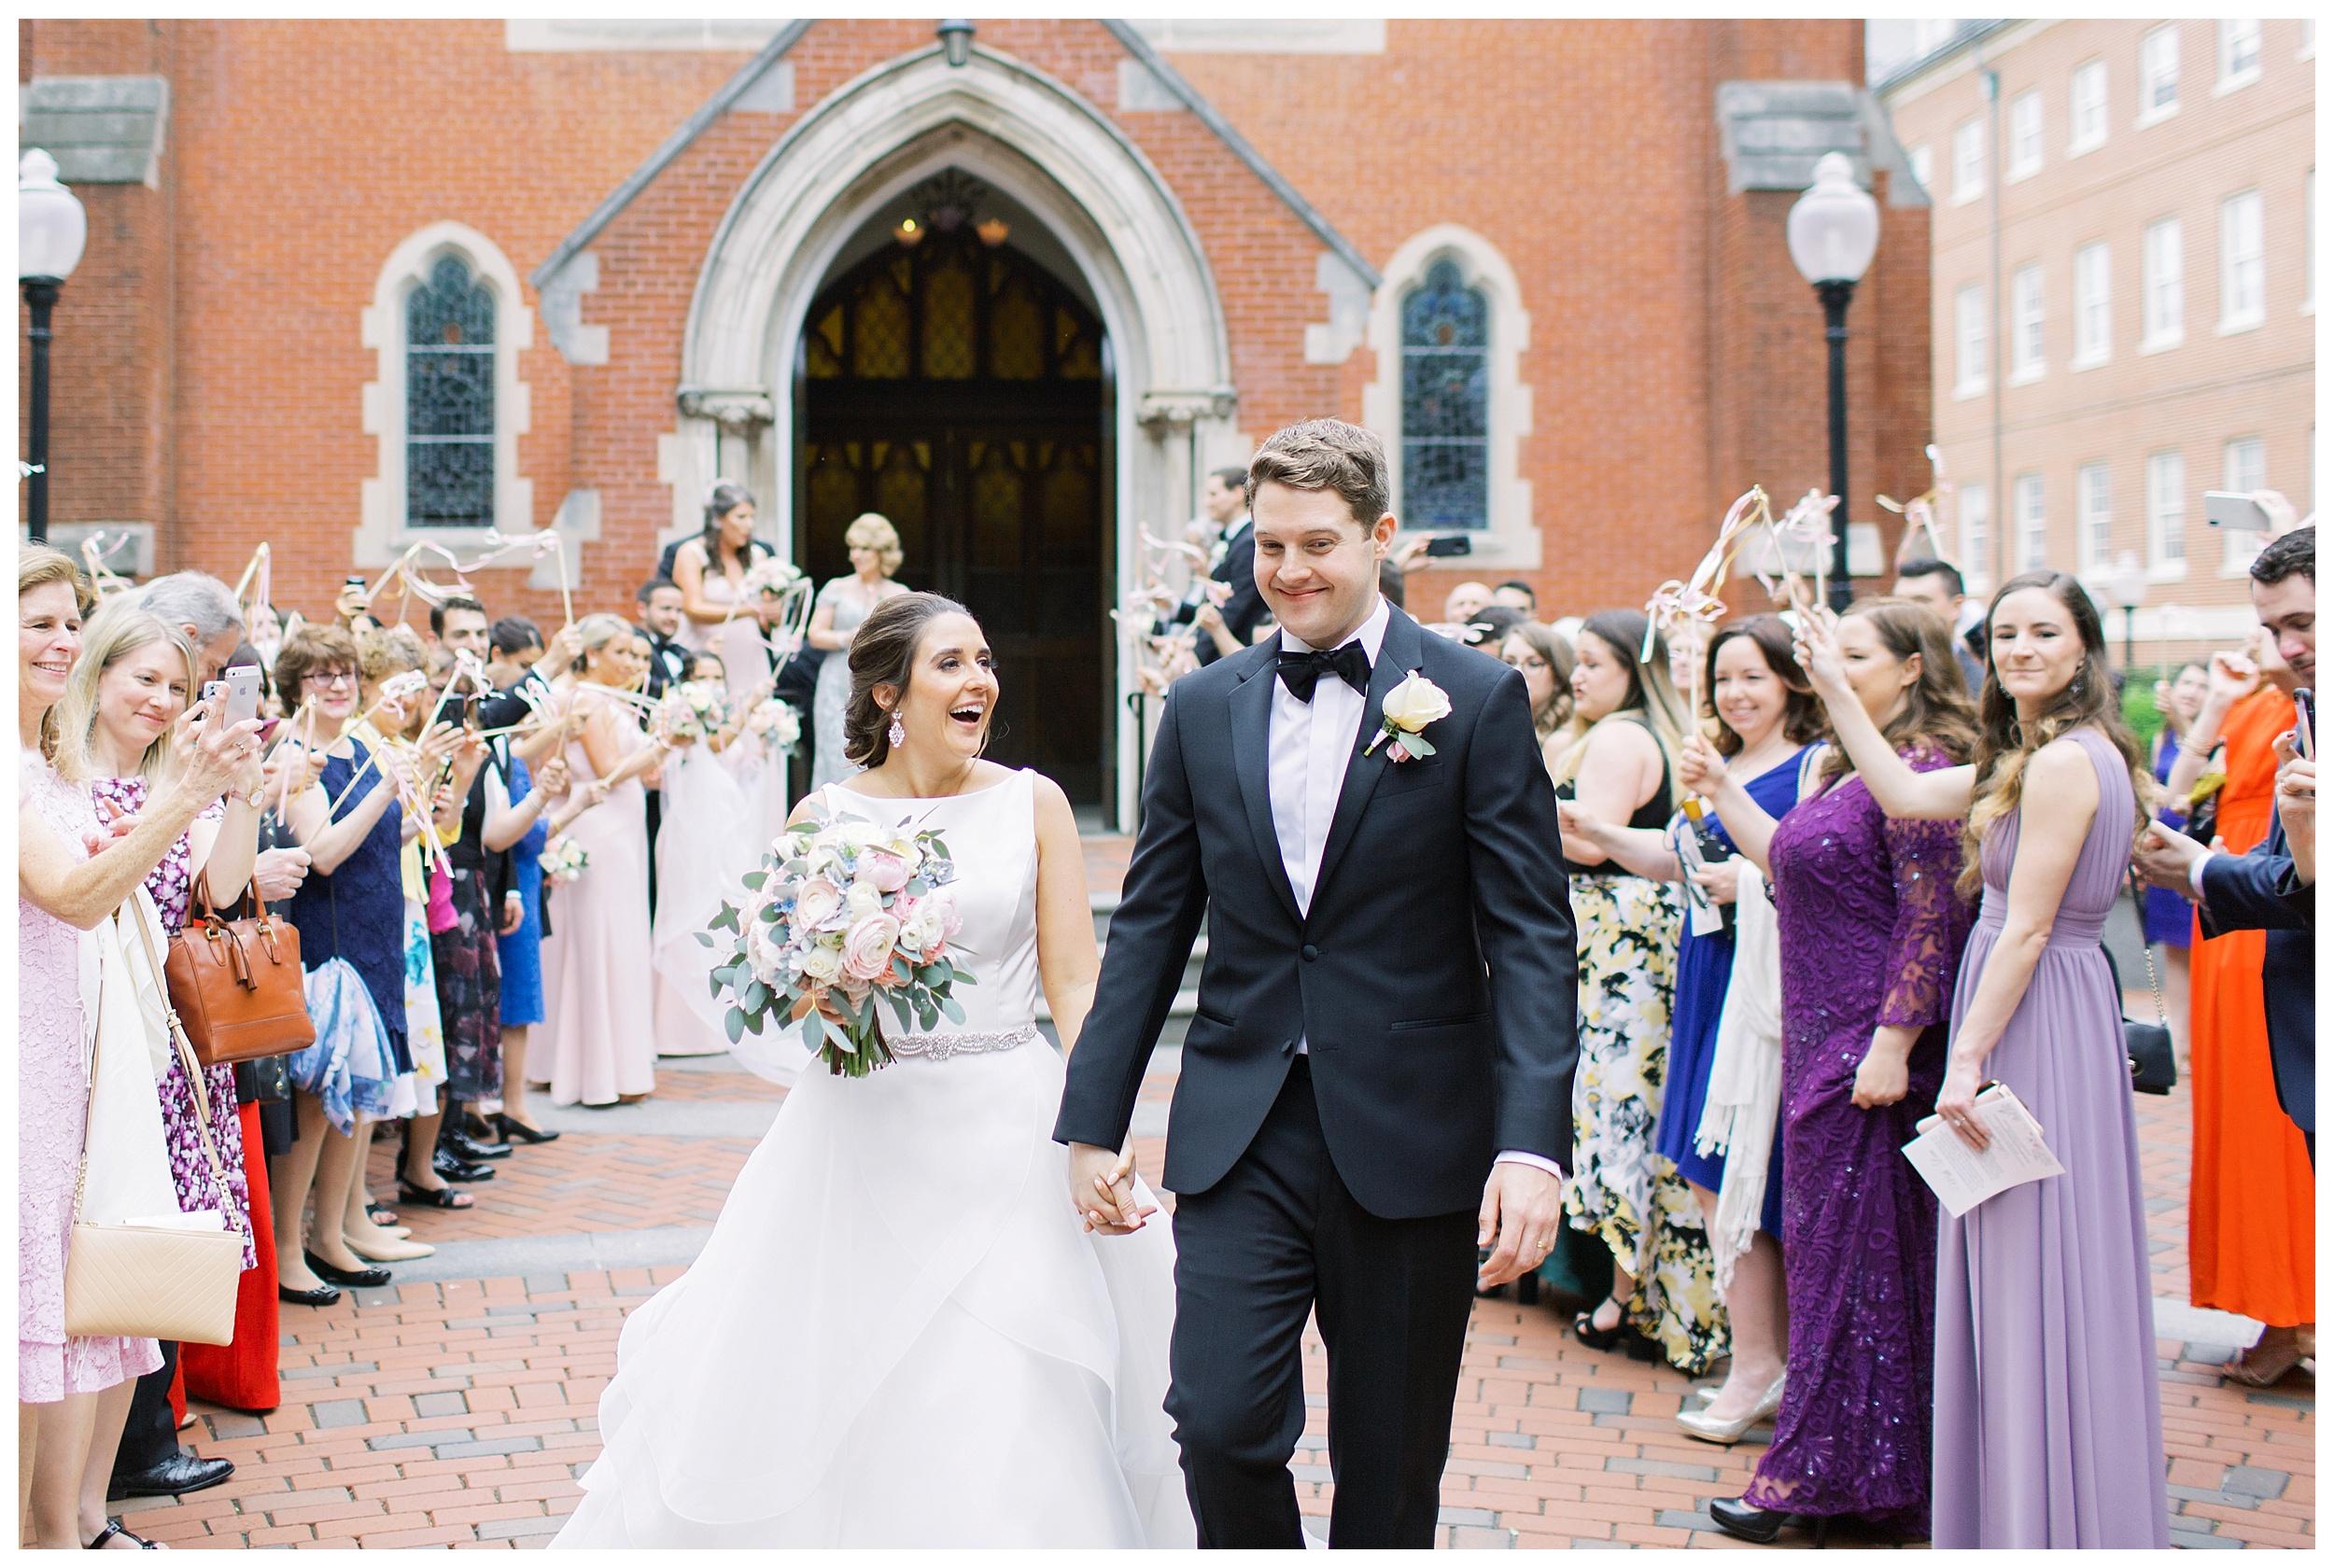 DAR Constitution Hall Wedding Wedding | Daughters of the American Revolution Wedding | District of Columbia Film Wedding Photographer Kir Tuben_0054.jpg